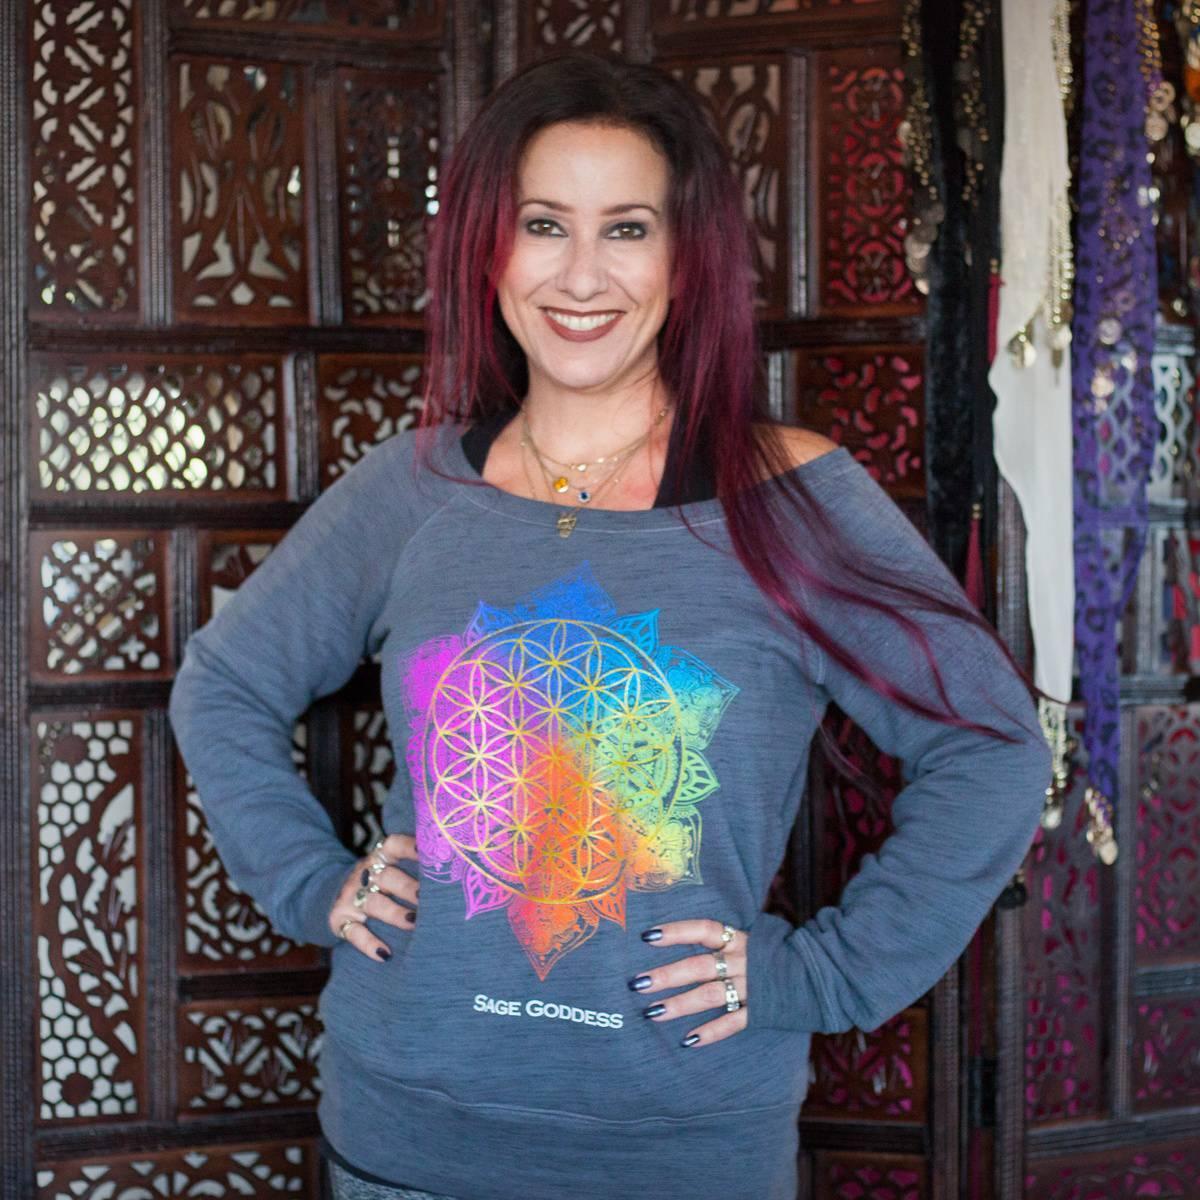 Rainbow Flower of Life Sweatshirt 1_5